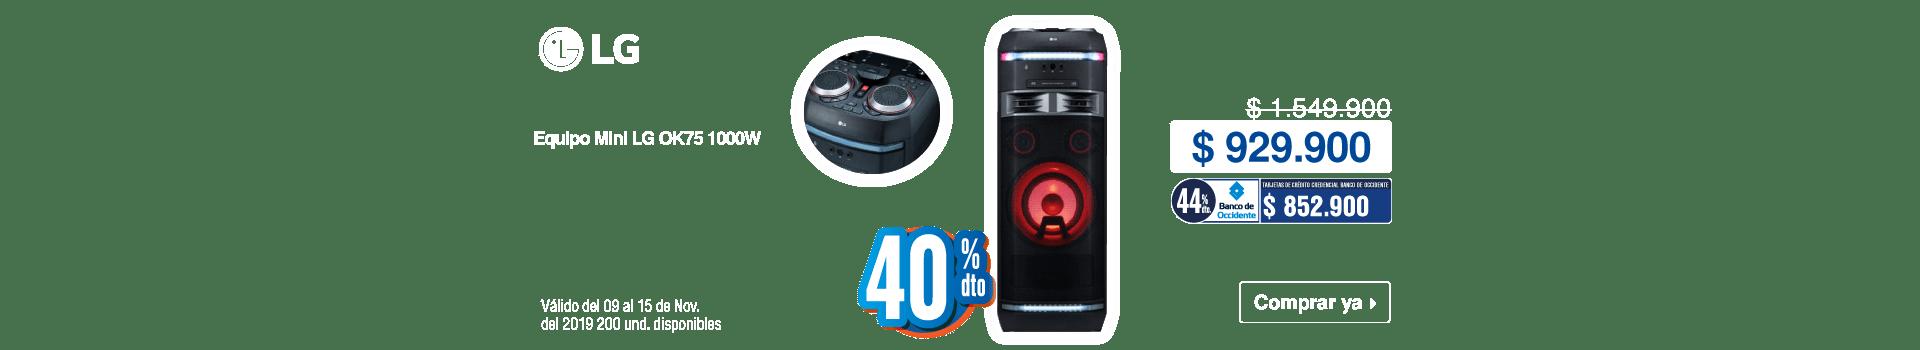 AK-AUDIO-LG-OK75-CAT2-09NOV